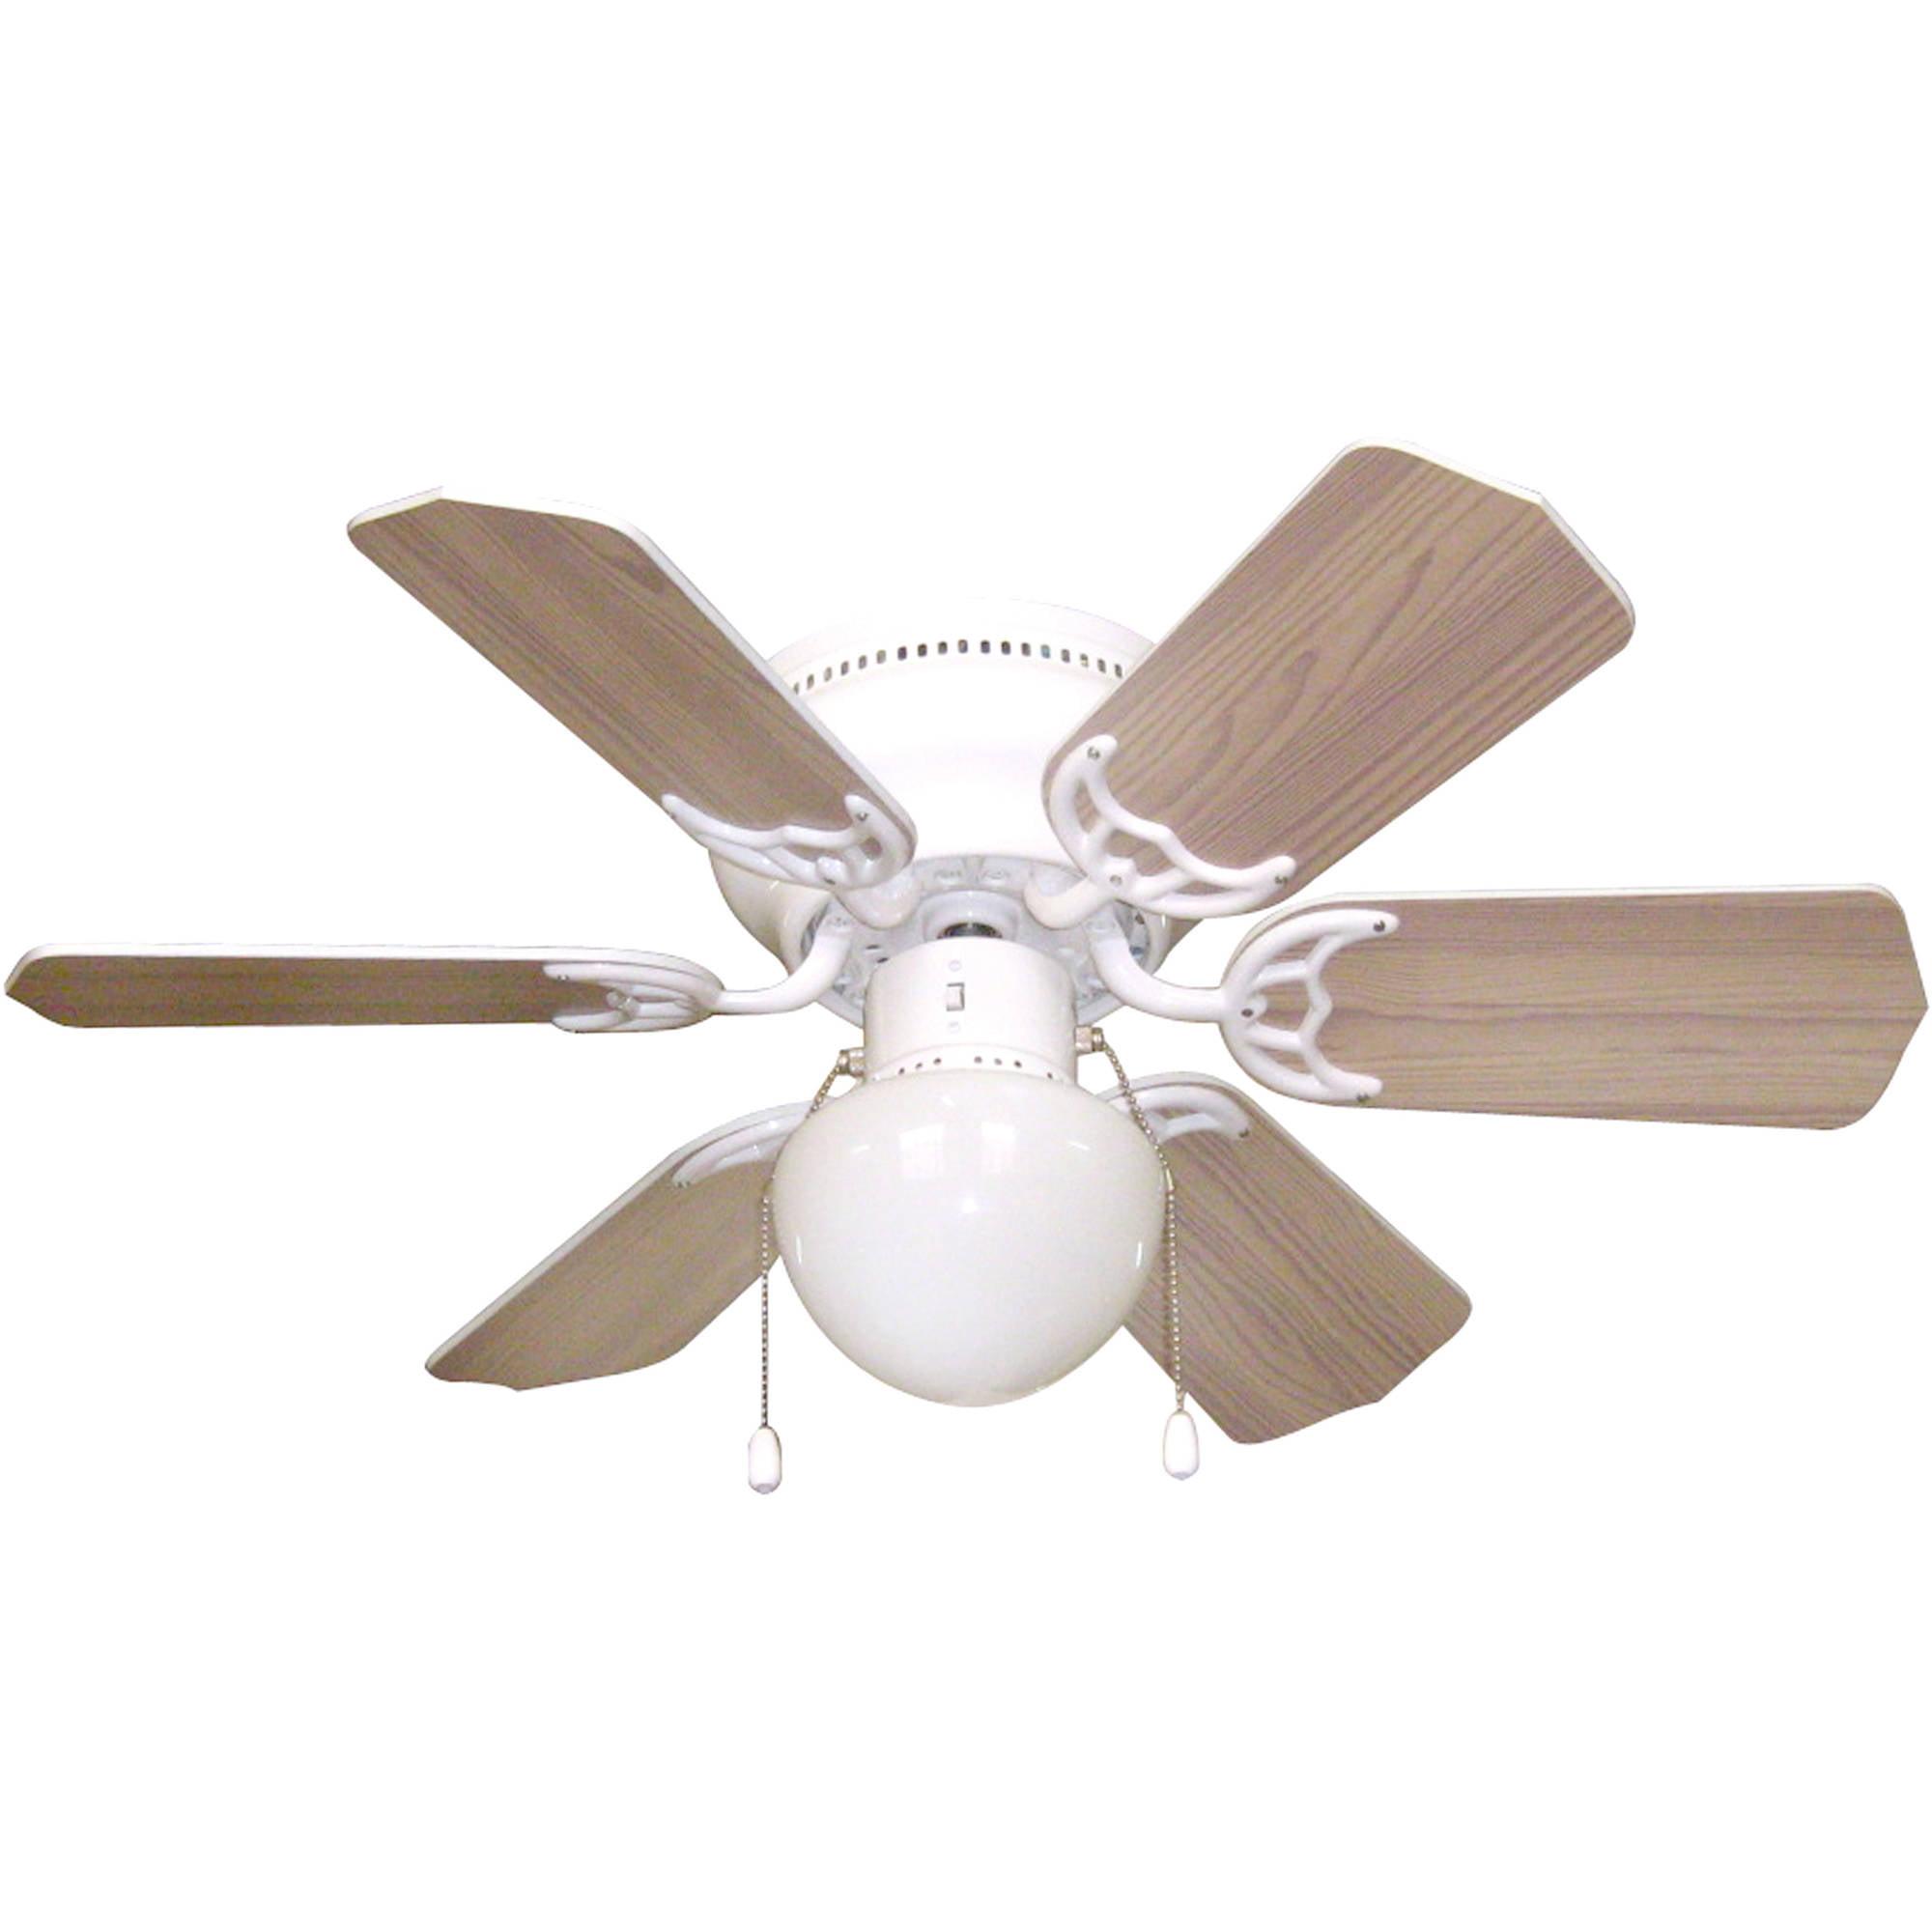 "Litex Industries Vortex Hugger 30"" Hugger Ceiling Fan White"